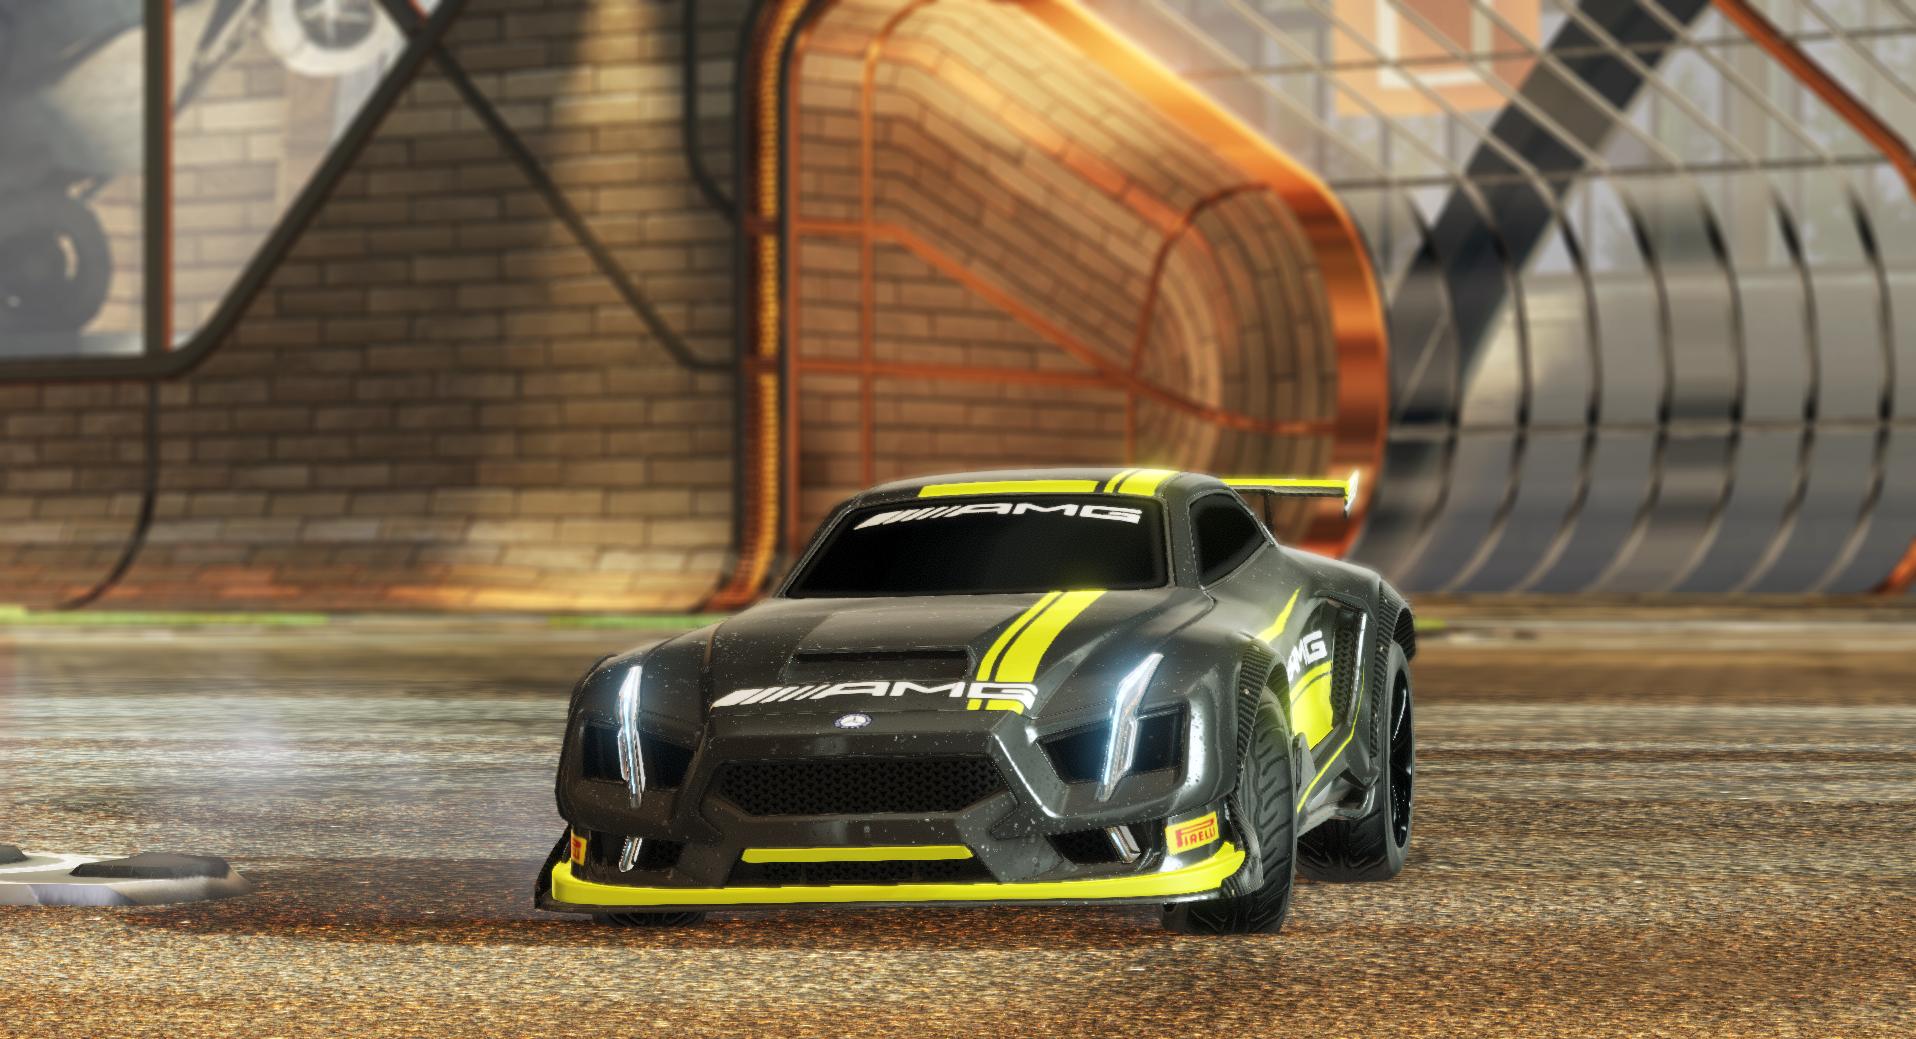 Maverick – Mercedes AMG Livery